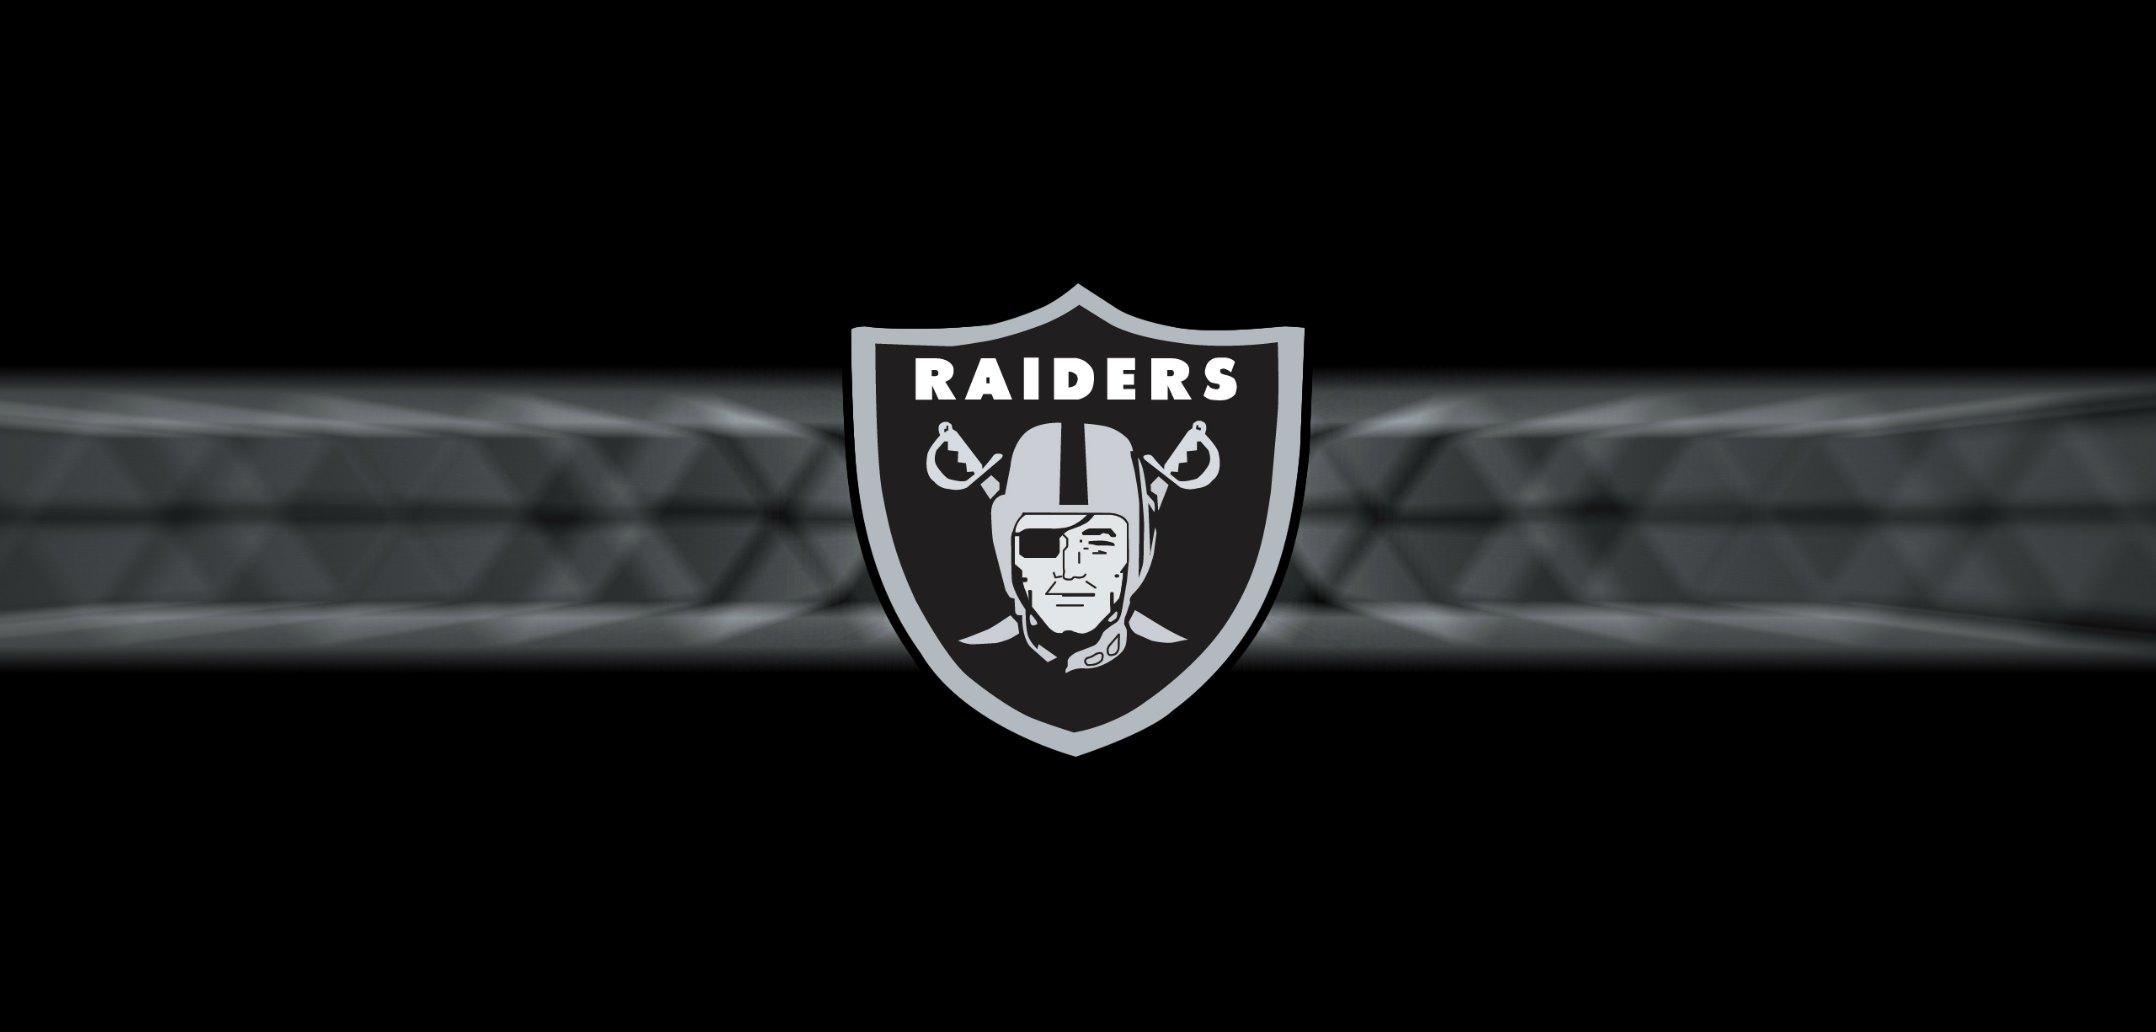 Free 3d Oakland Raiders Live Wallpaper The Five Best Nfl Draft Picks In Oakland Raiders History